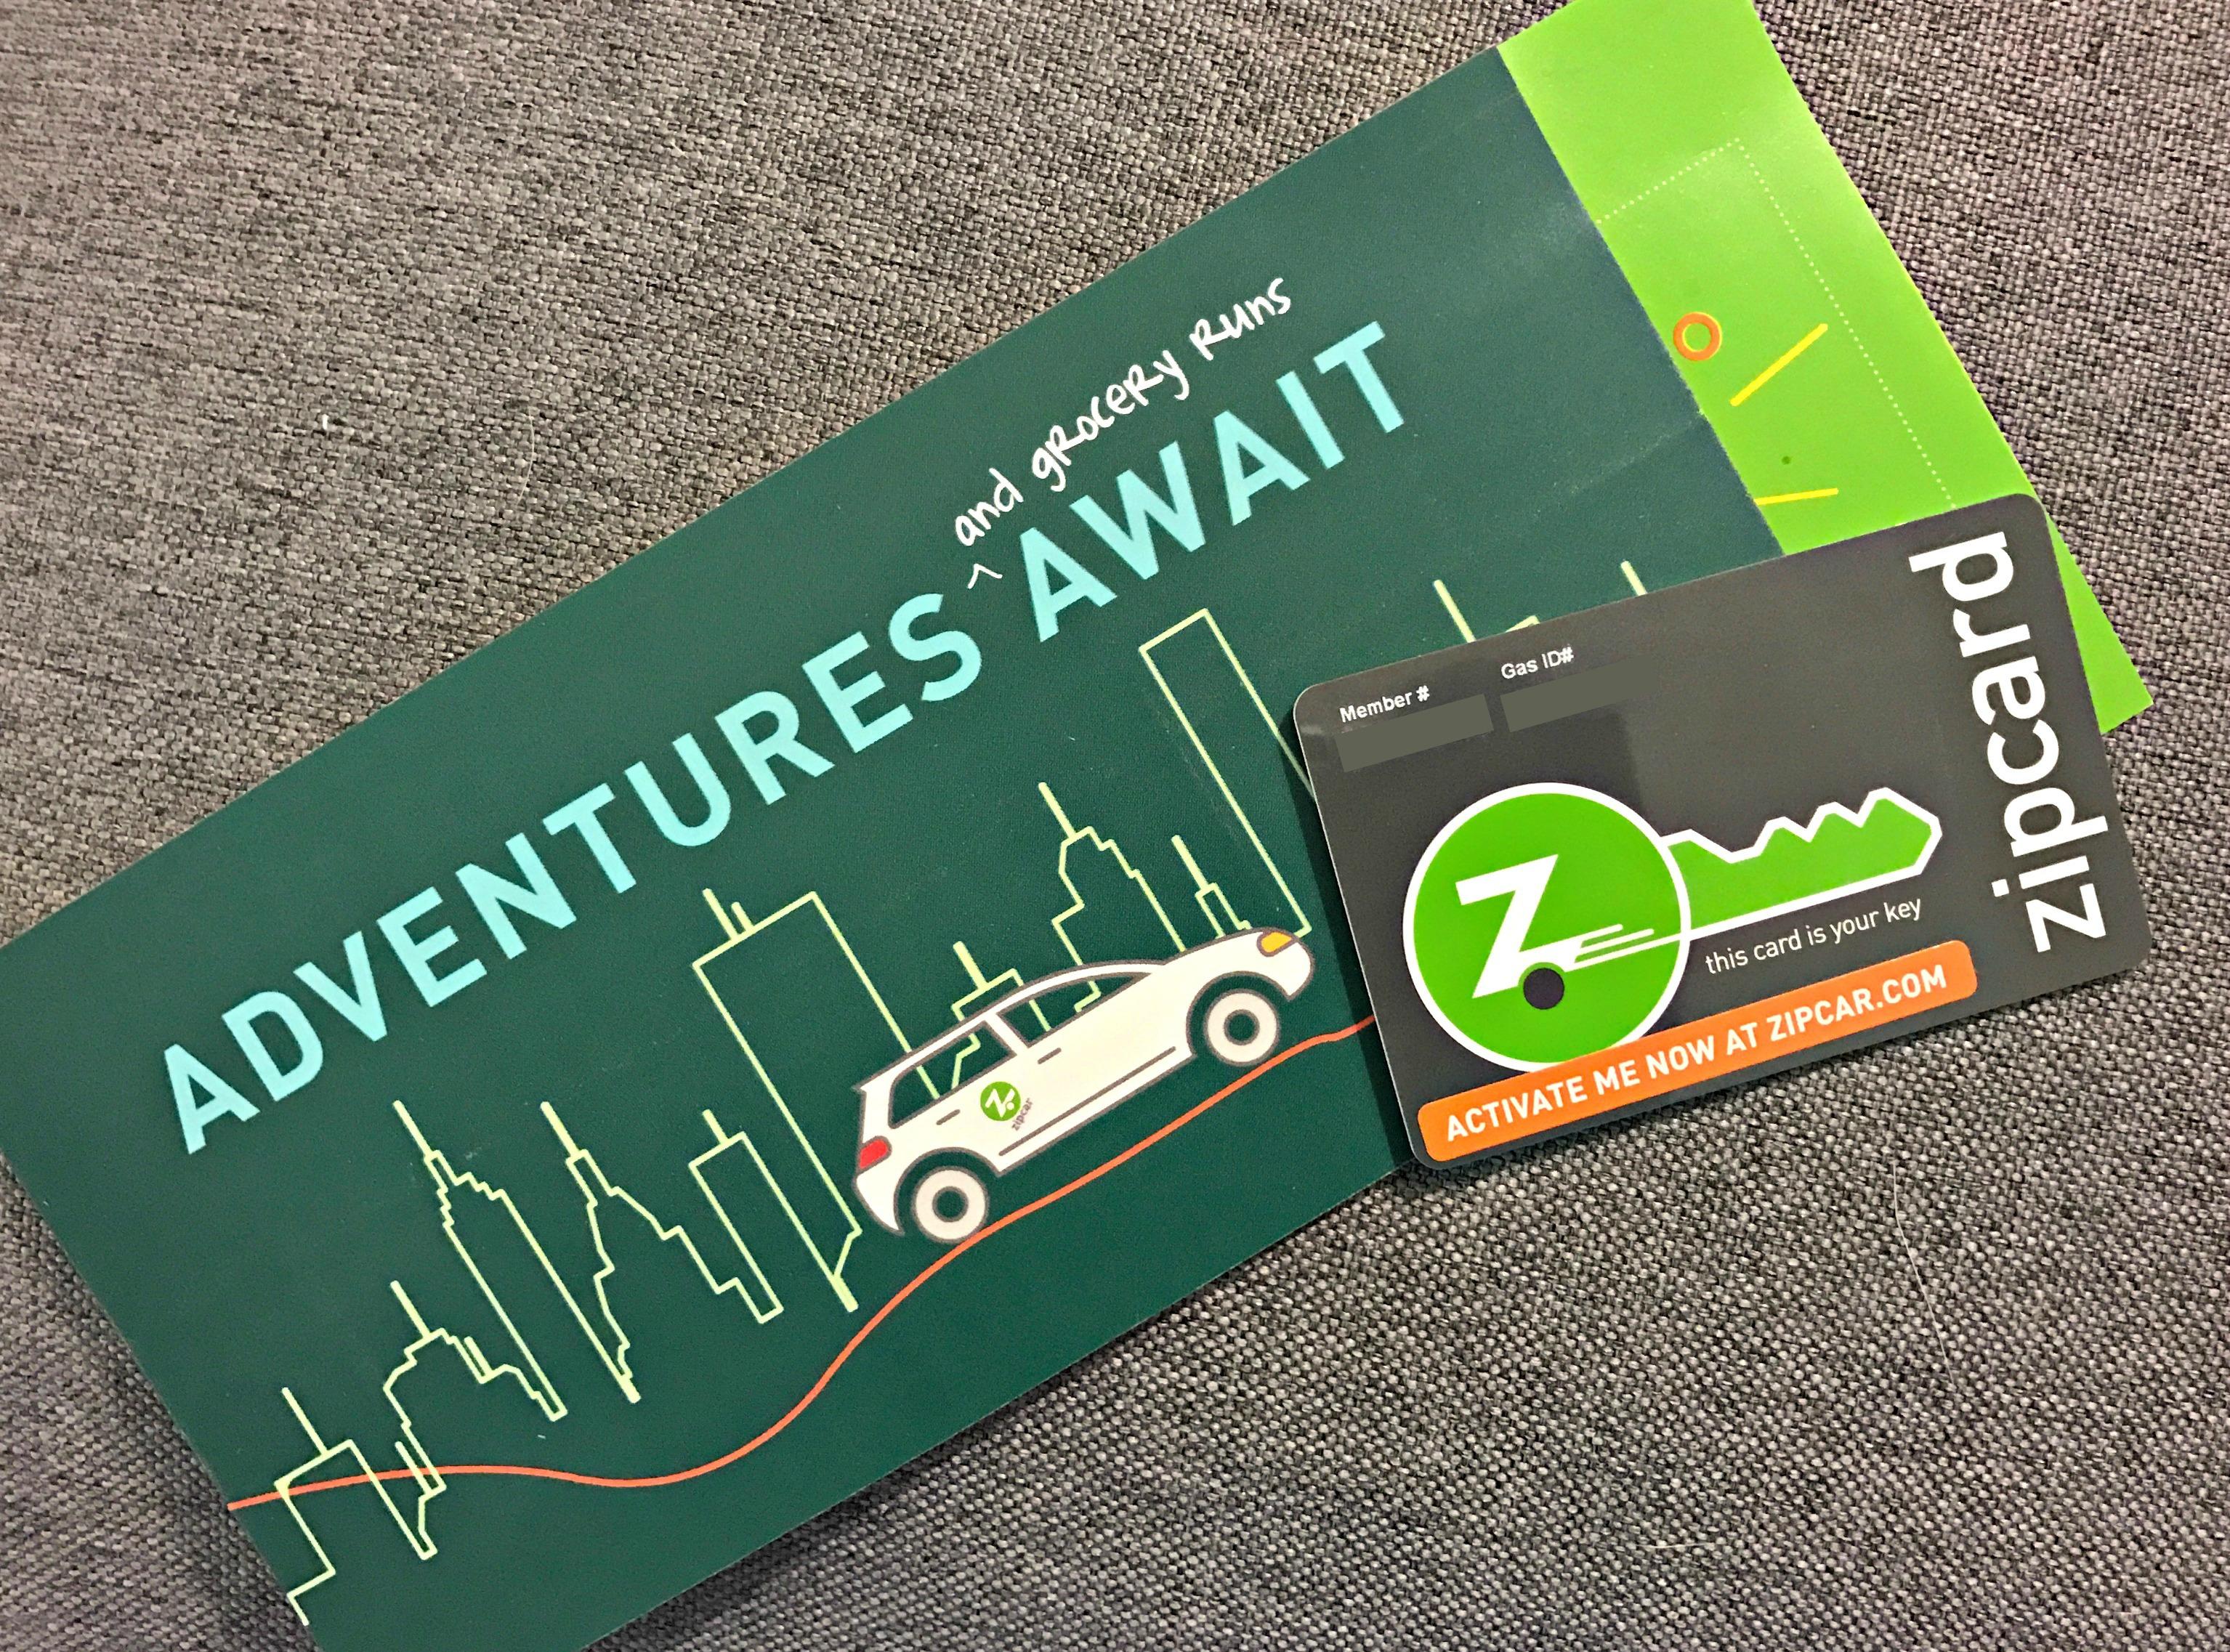 zipcar-zipcard-key